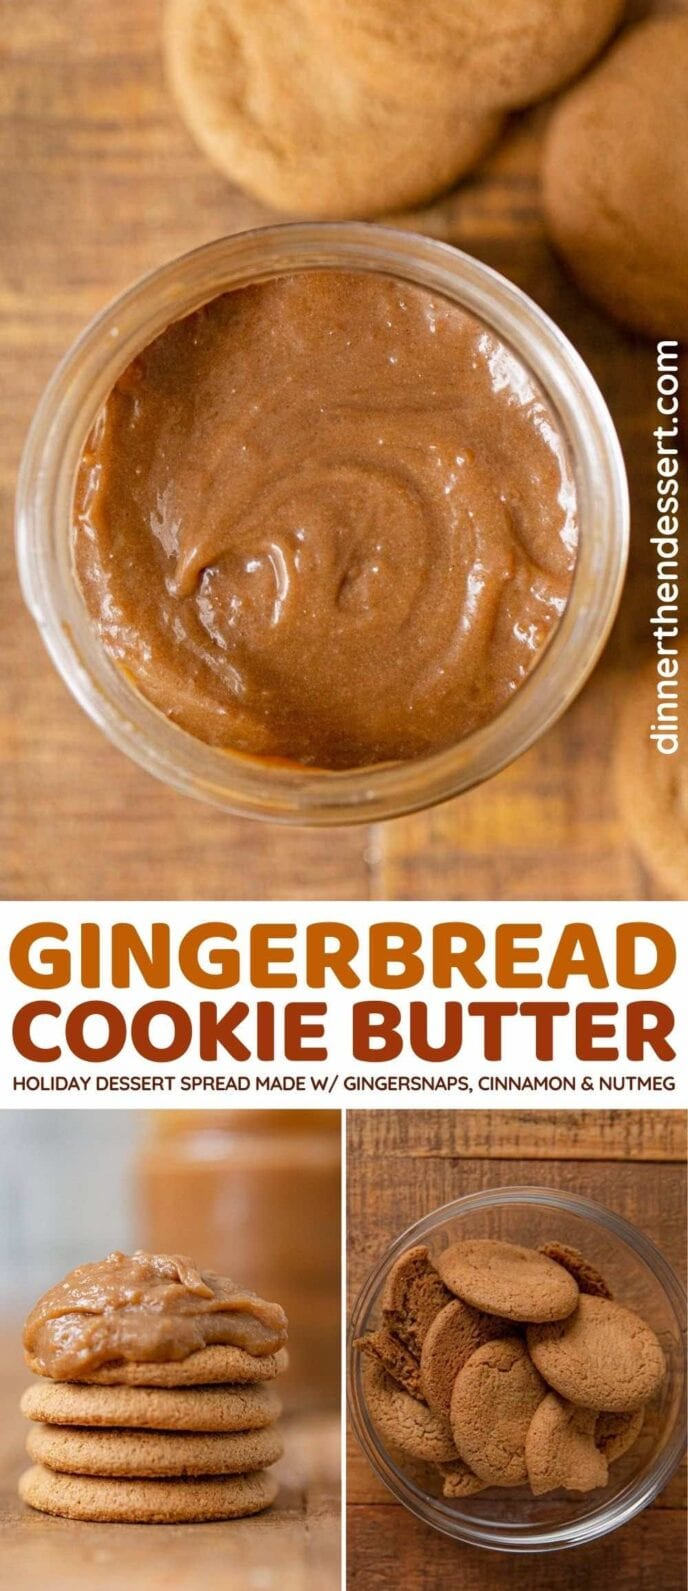 Gingerbread Cookie Butter recipe